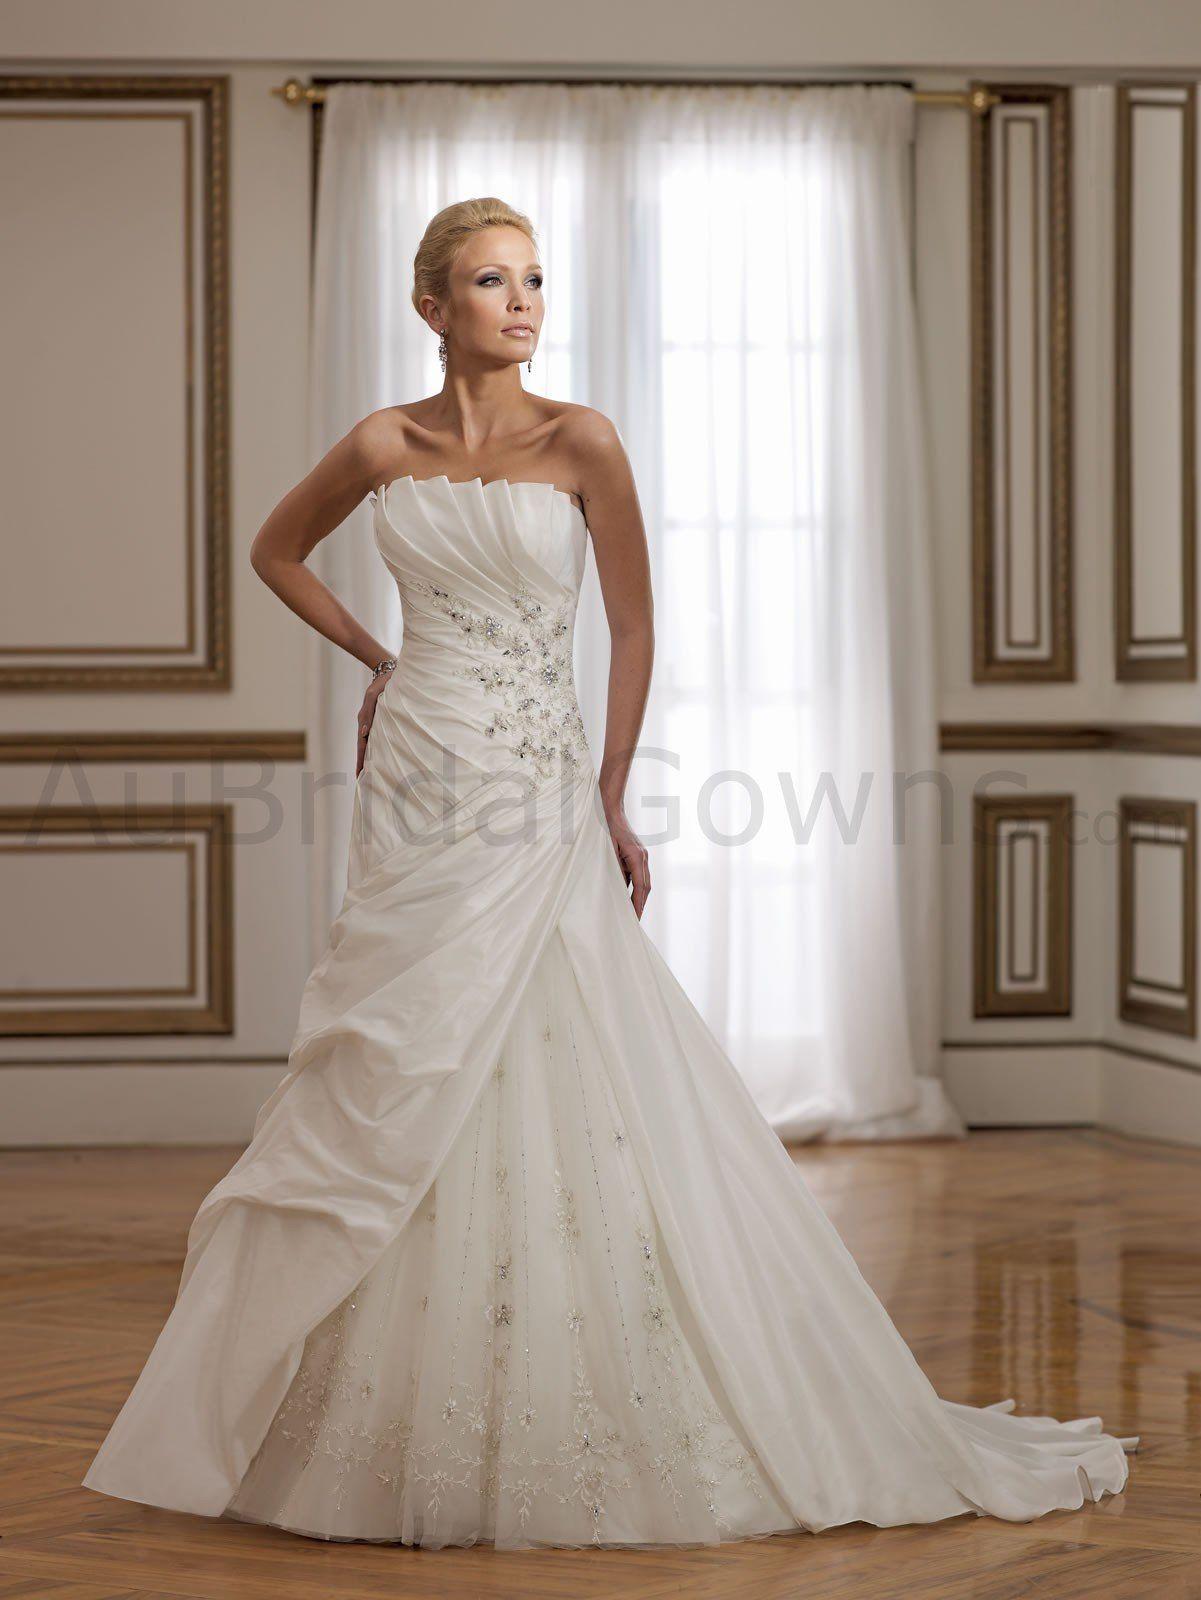 Taffeta fold Neckline Draping Bodice A-line Wedding Dress